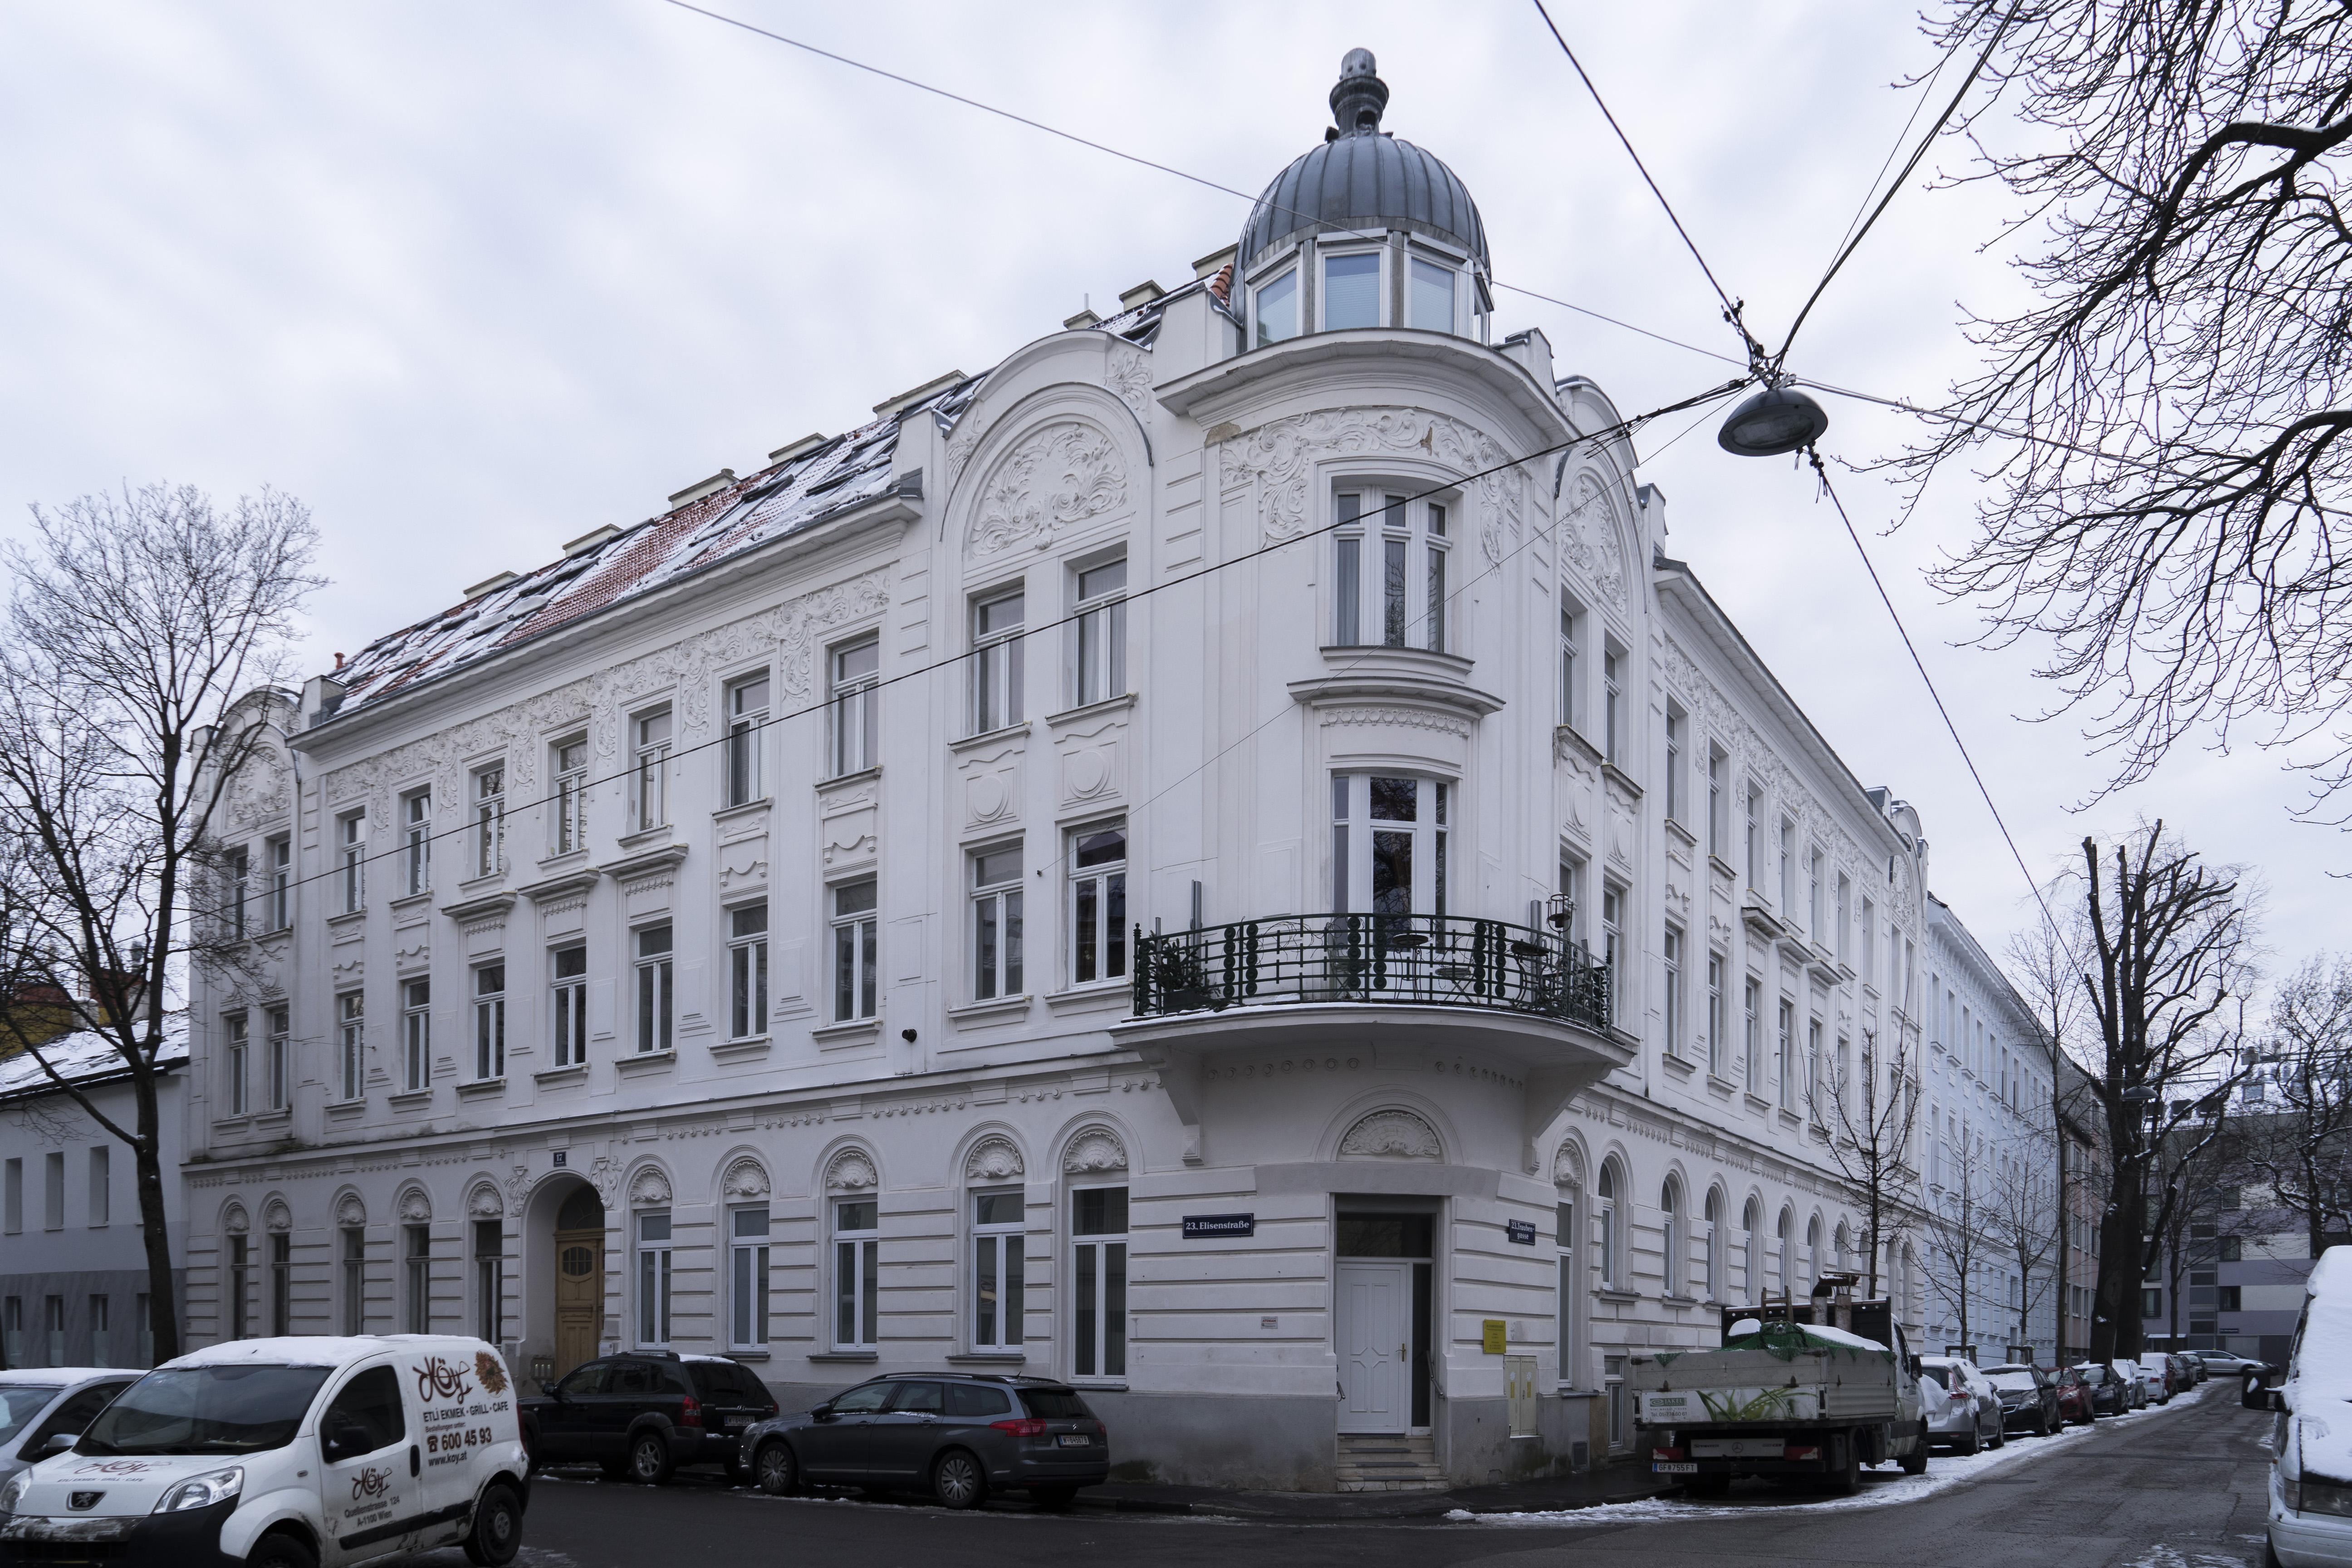 DateiElisenstraße 20, Hubert Maresch.jpg – Wikipedia